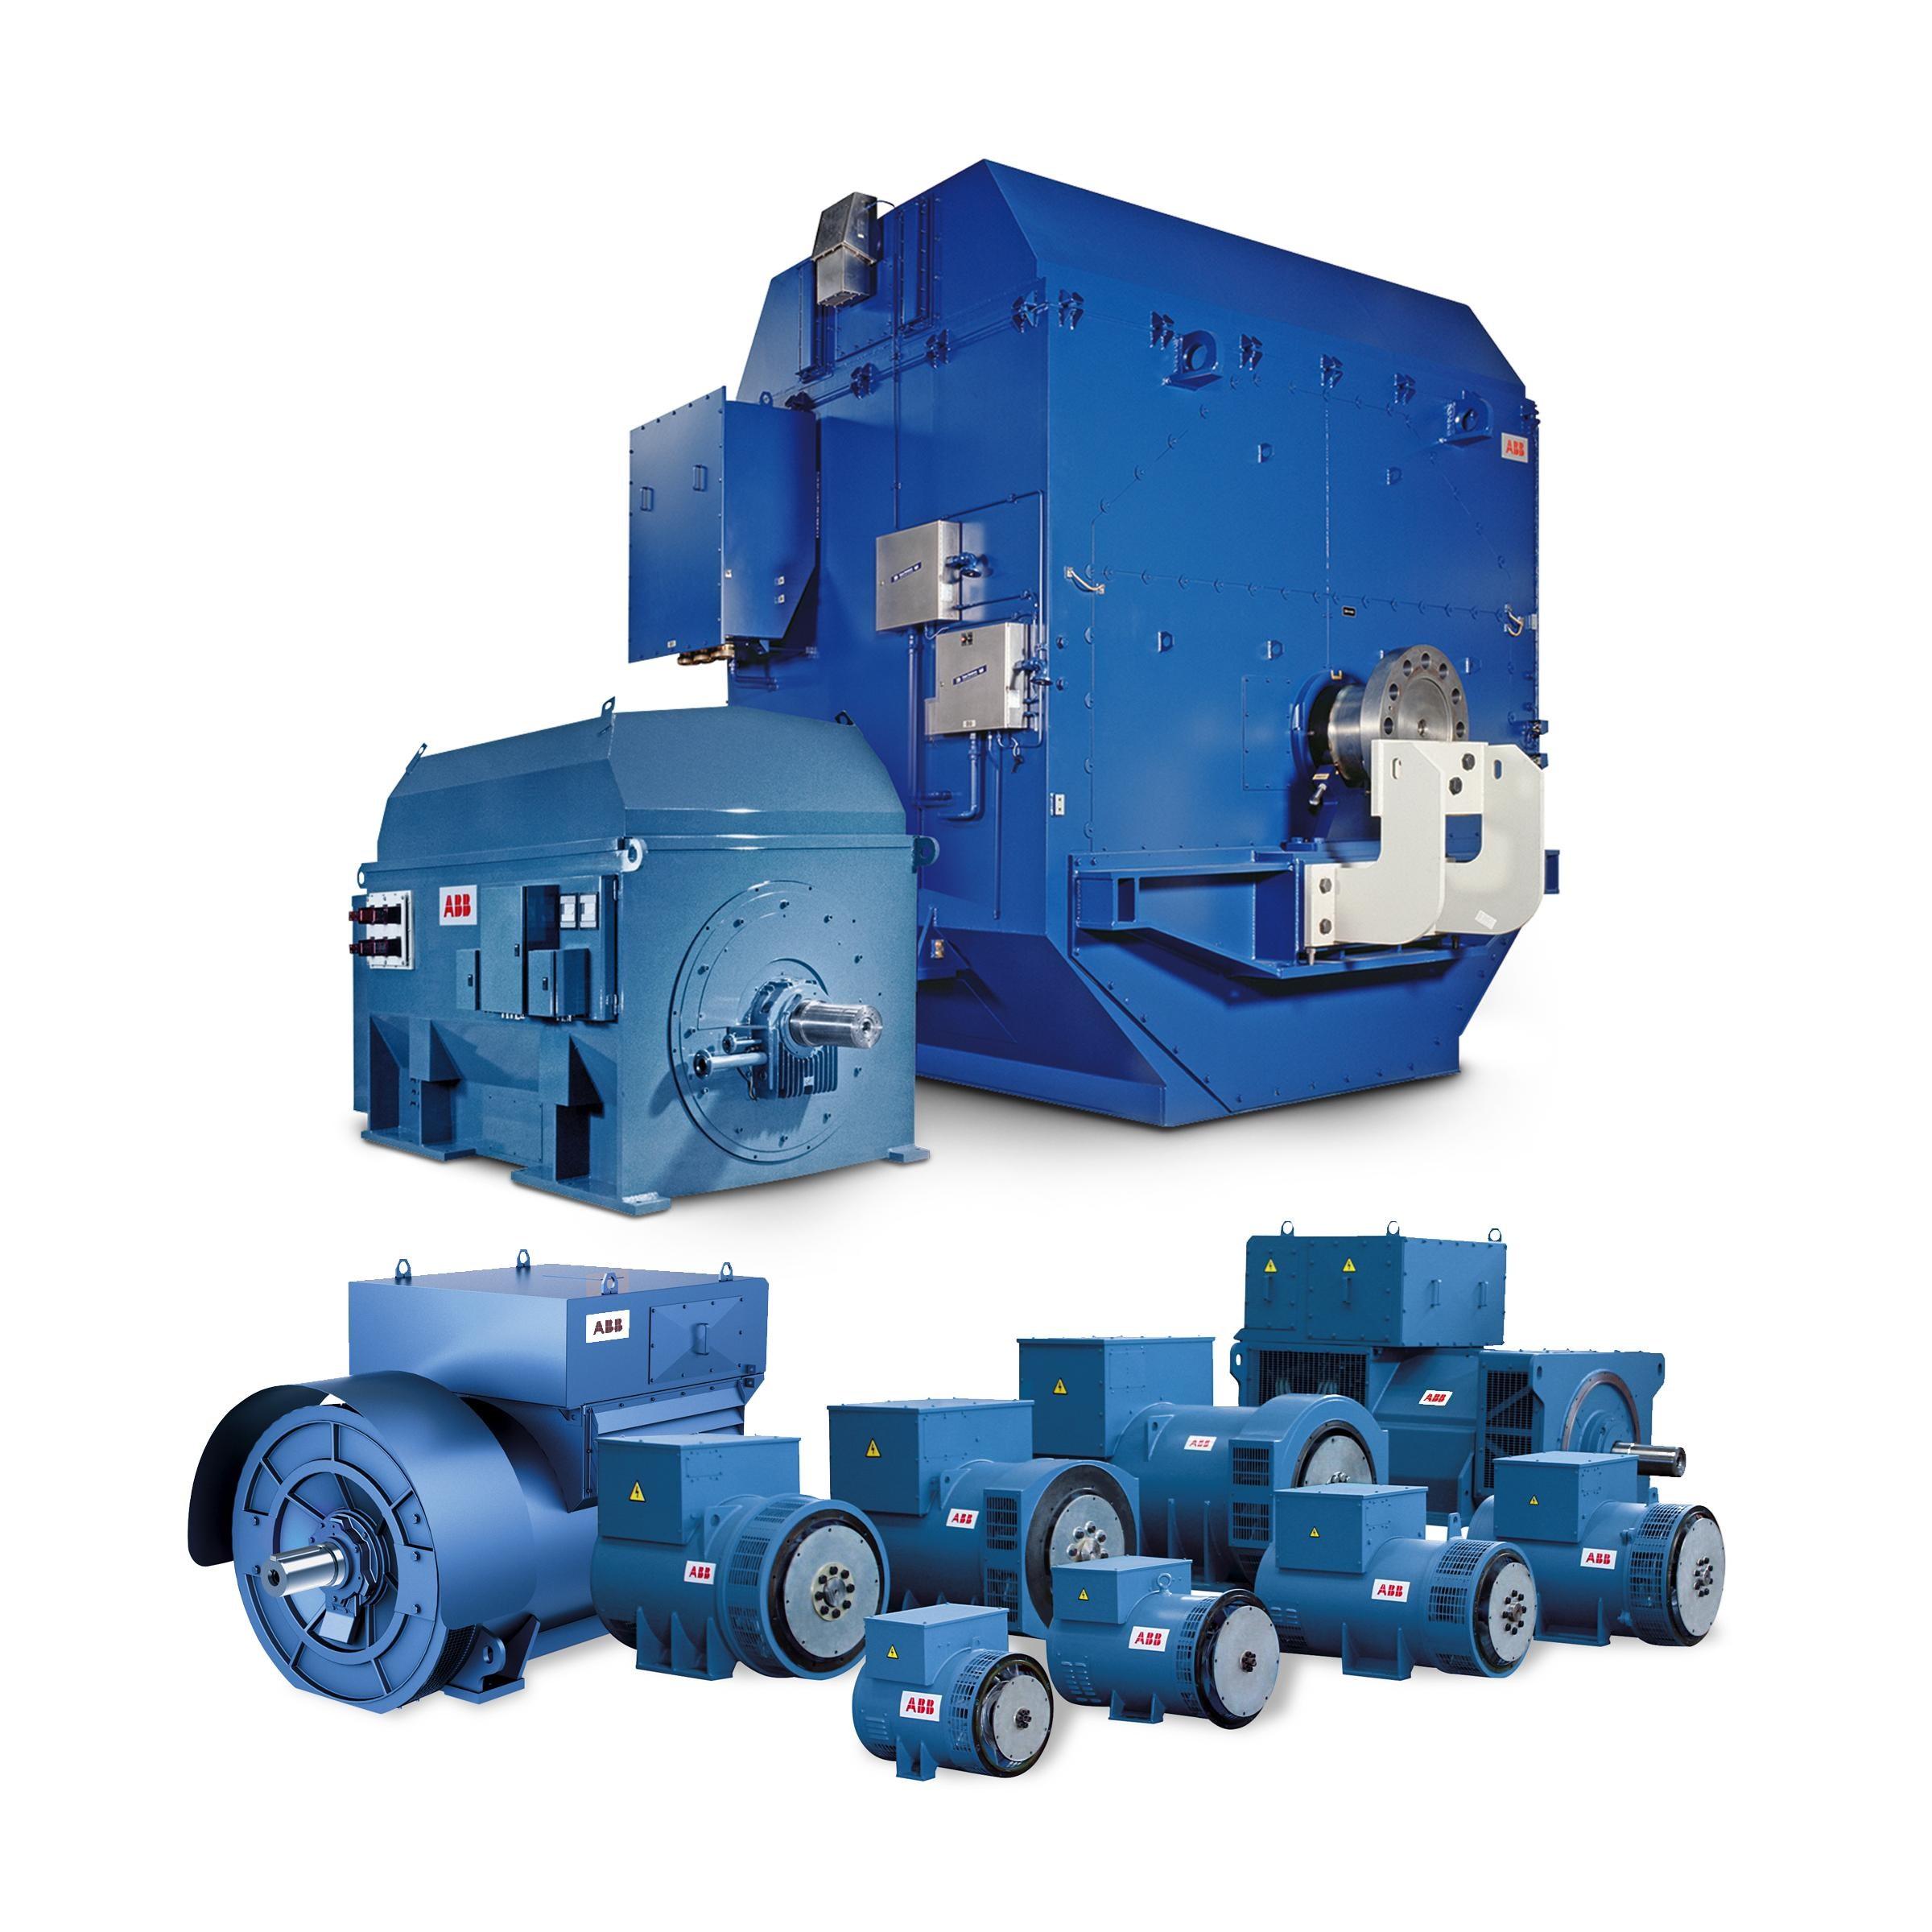 Baldor Electric Motor 84z04051 Wiring Diagram - Trusted Wiring Diagram